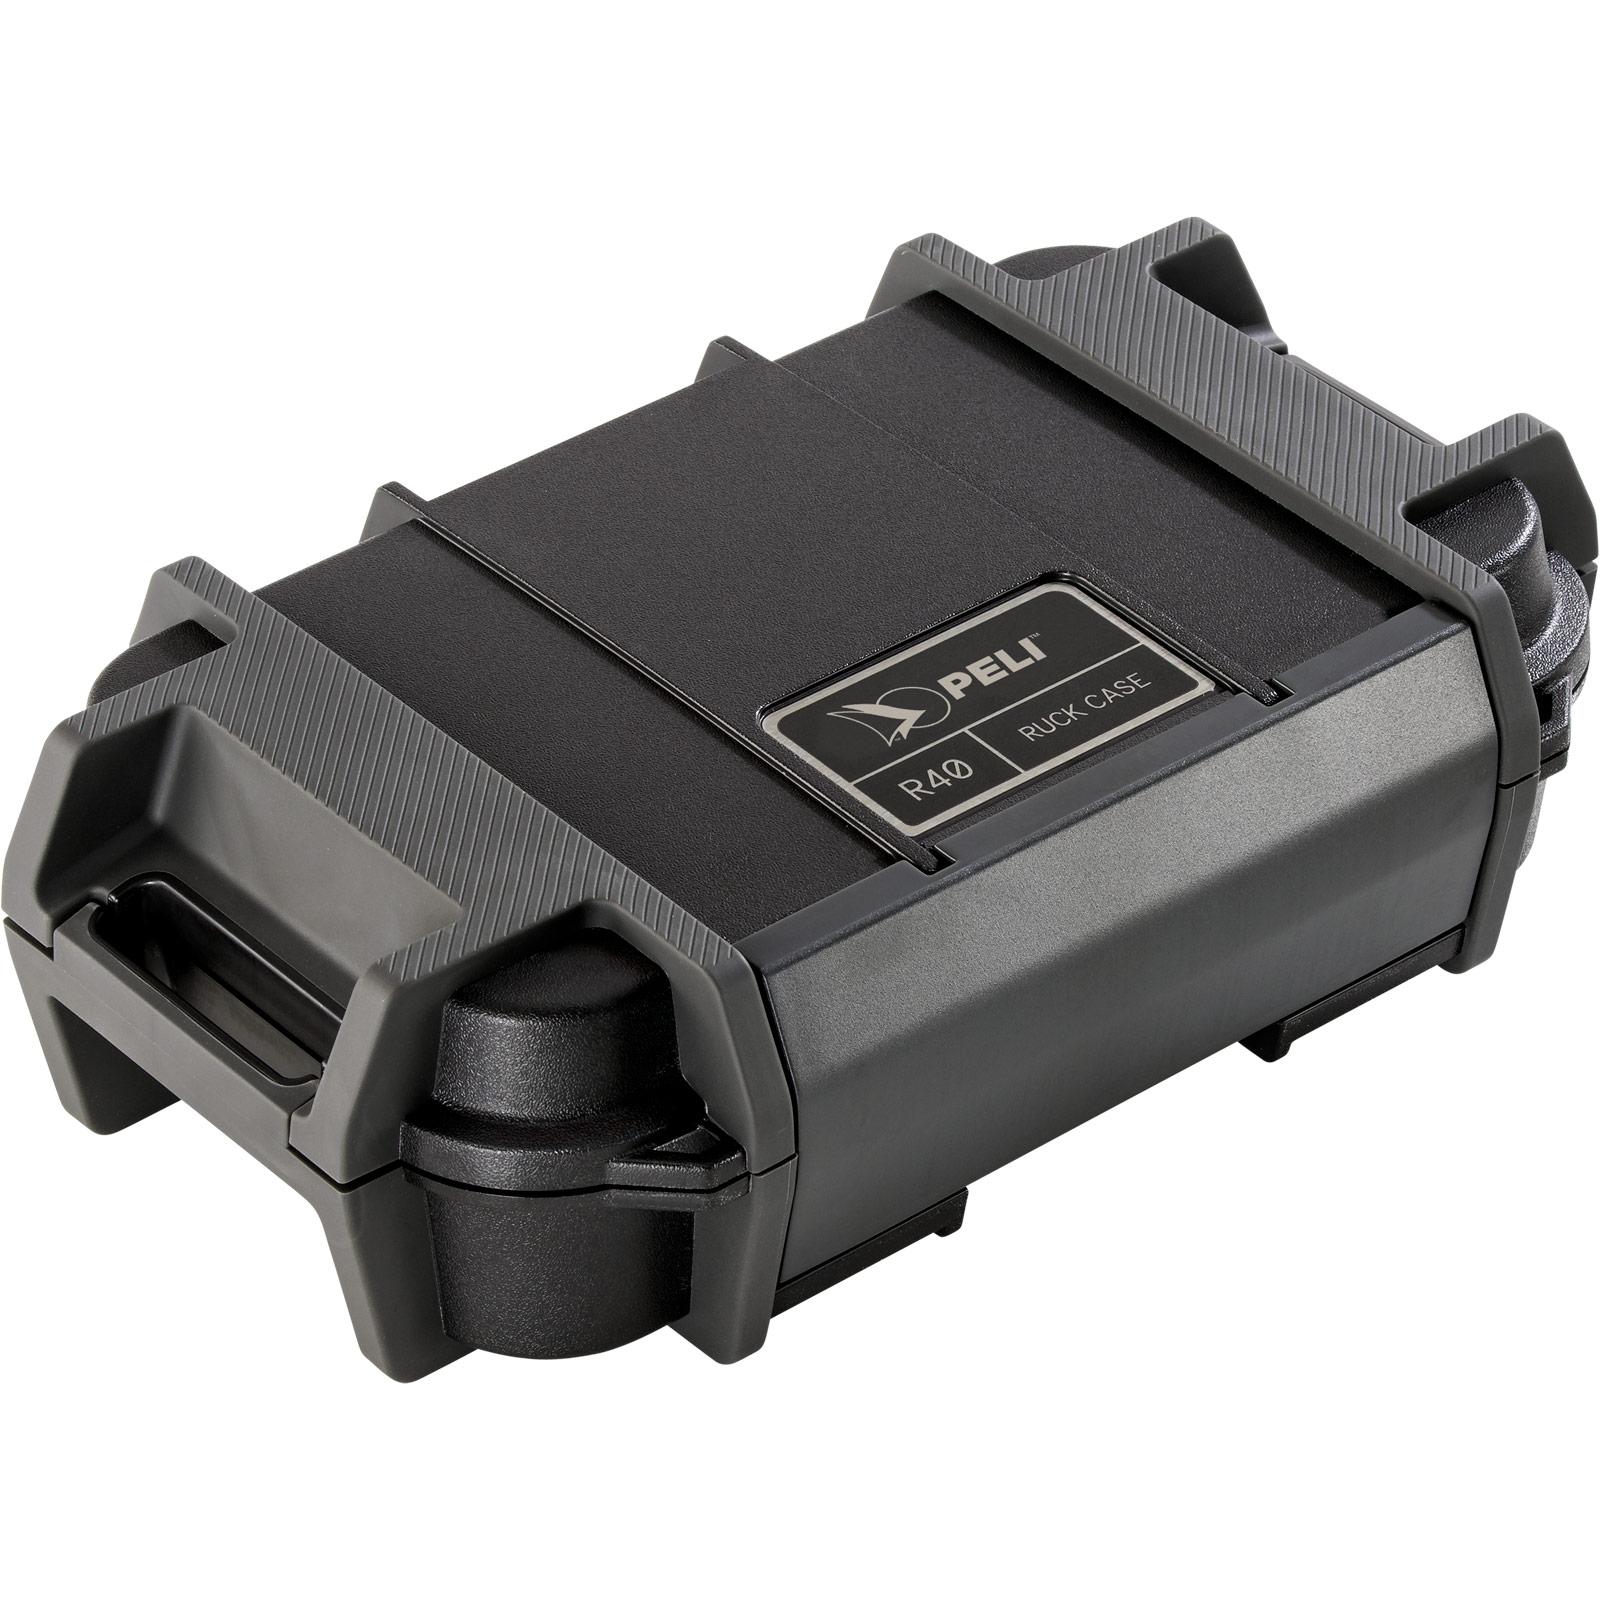 peli r40 ruck case personal utility cases